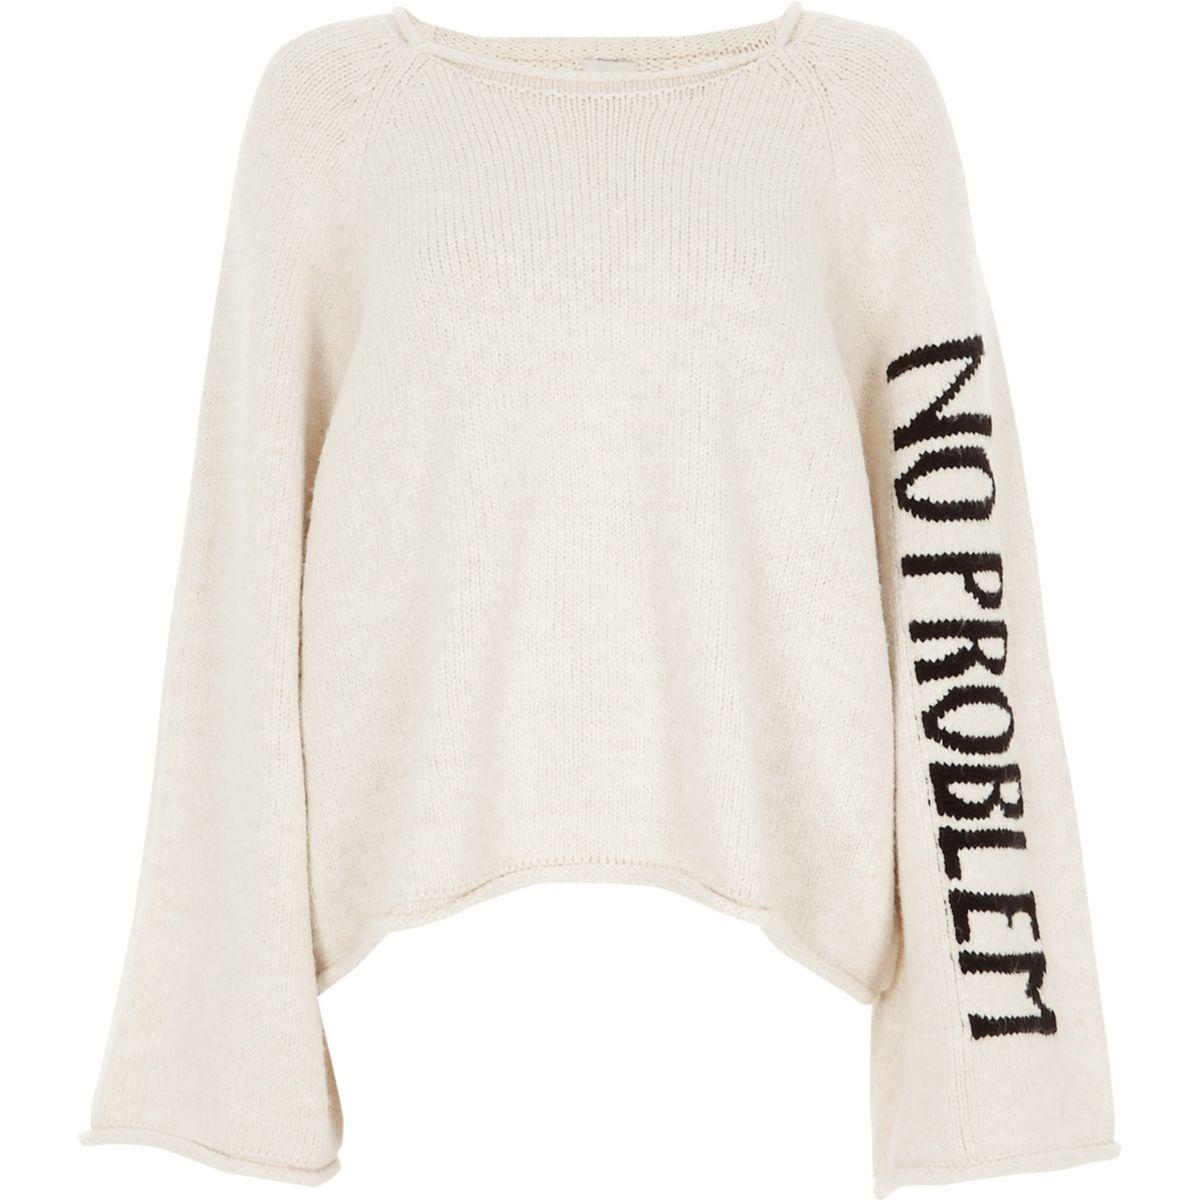 Cream wide sleeve 'no problem' sweater